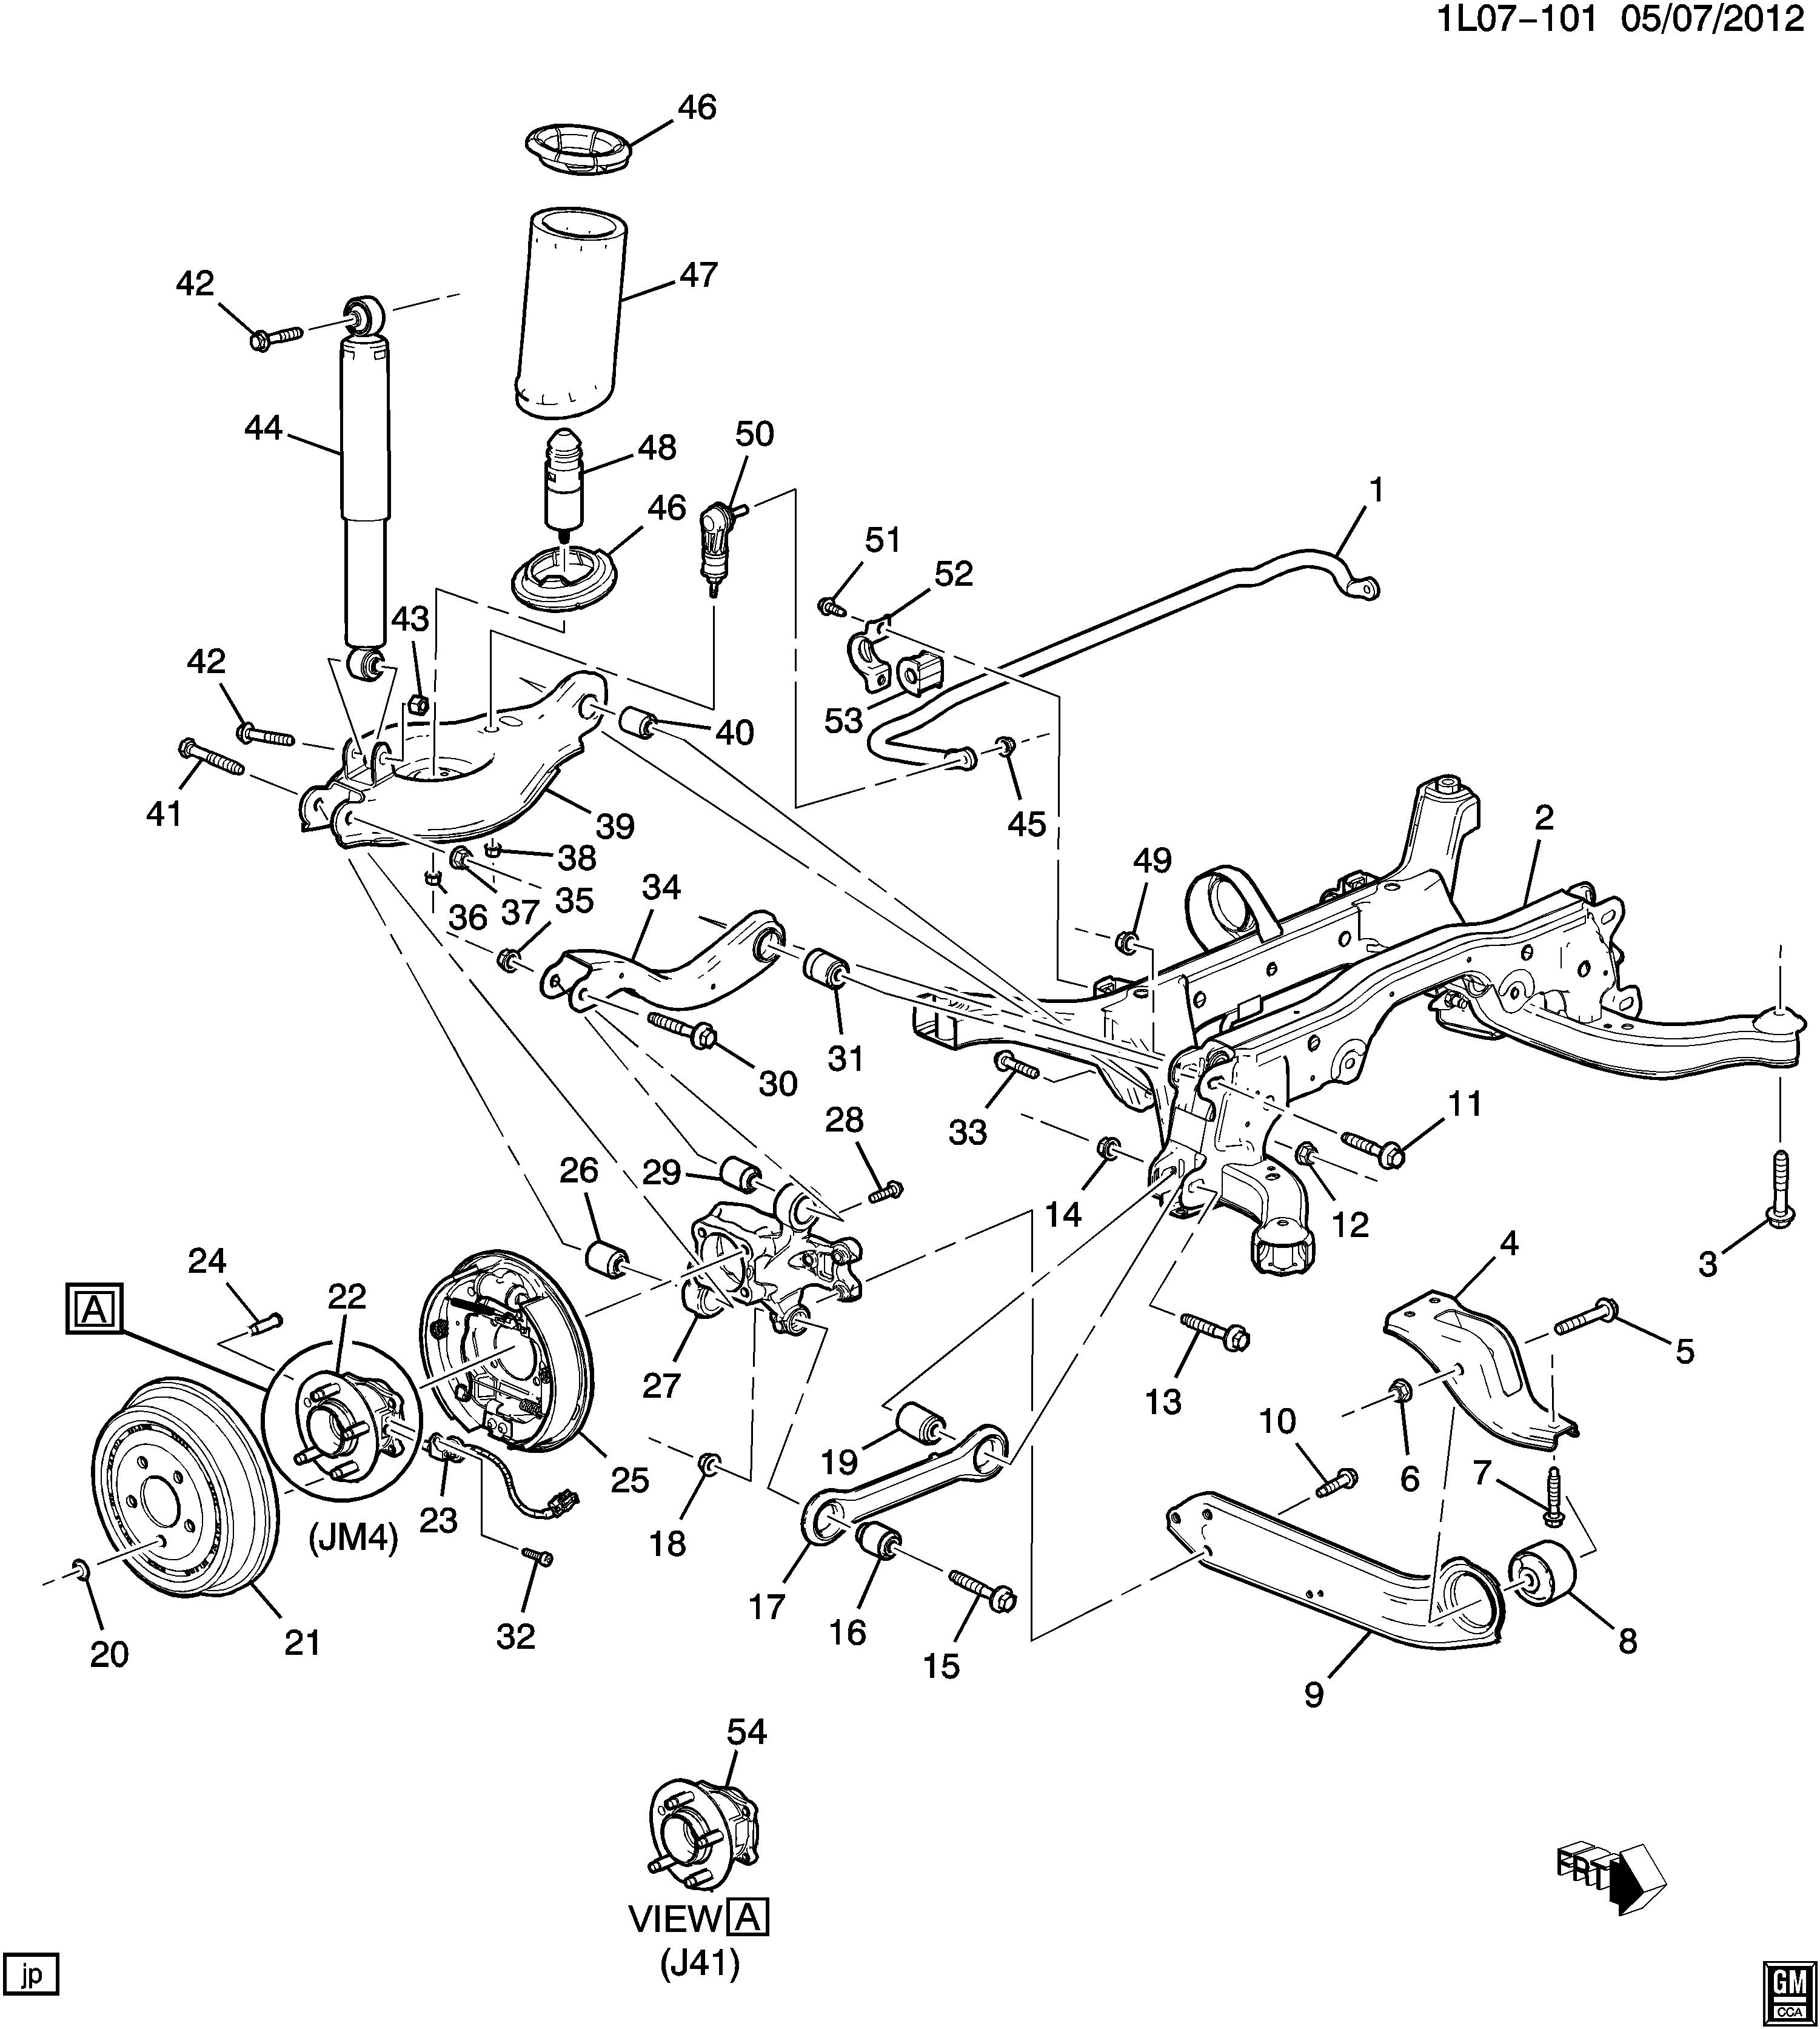 pontiac torrent lf suspension rear epc online nemiga Mach 2 Insecticide